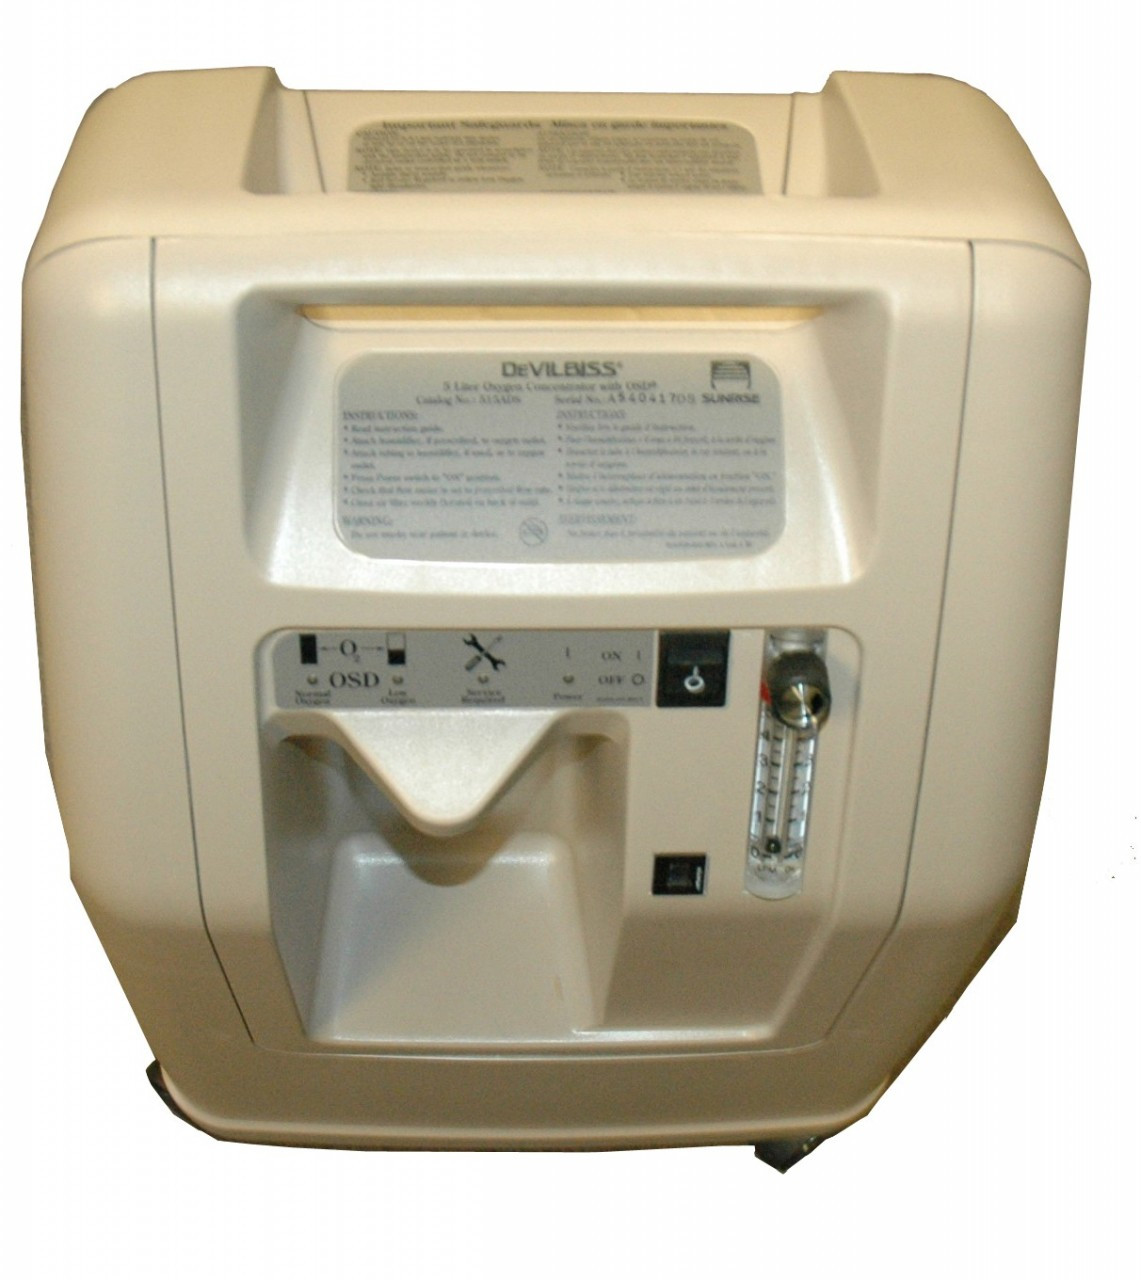 DeVilbiss 525 Home Oxygen Concentrator | Phoenix Mesa